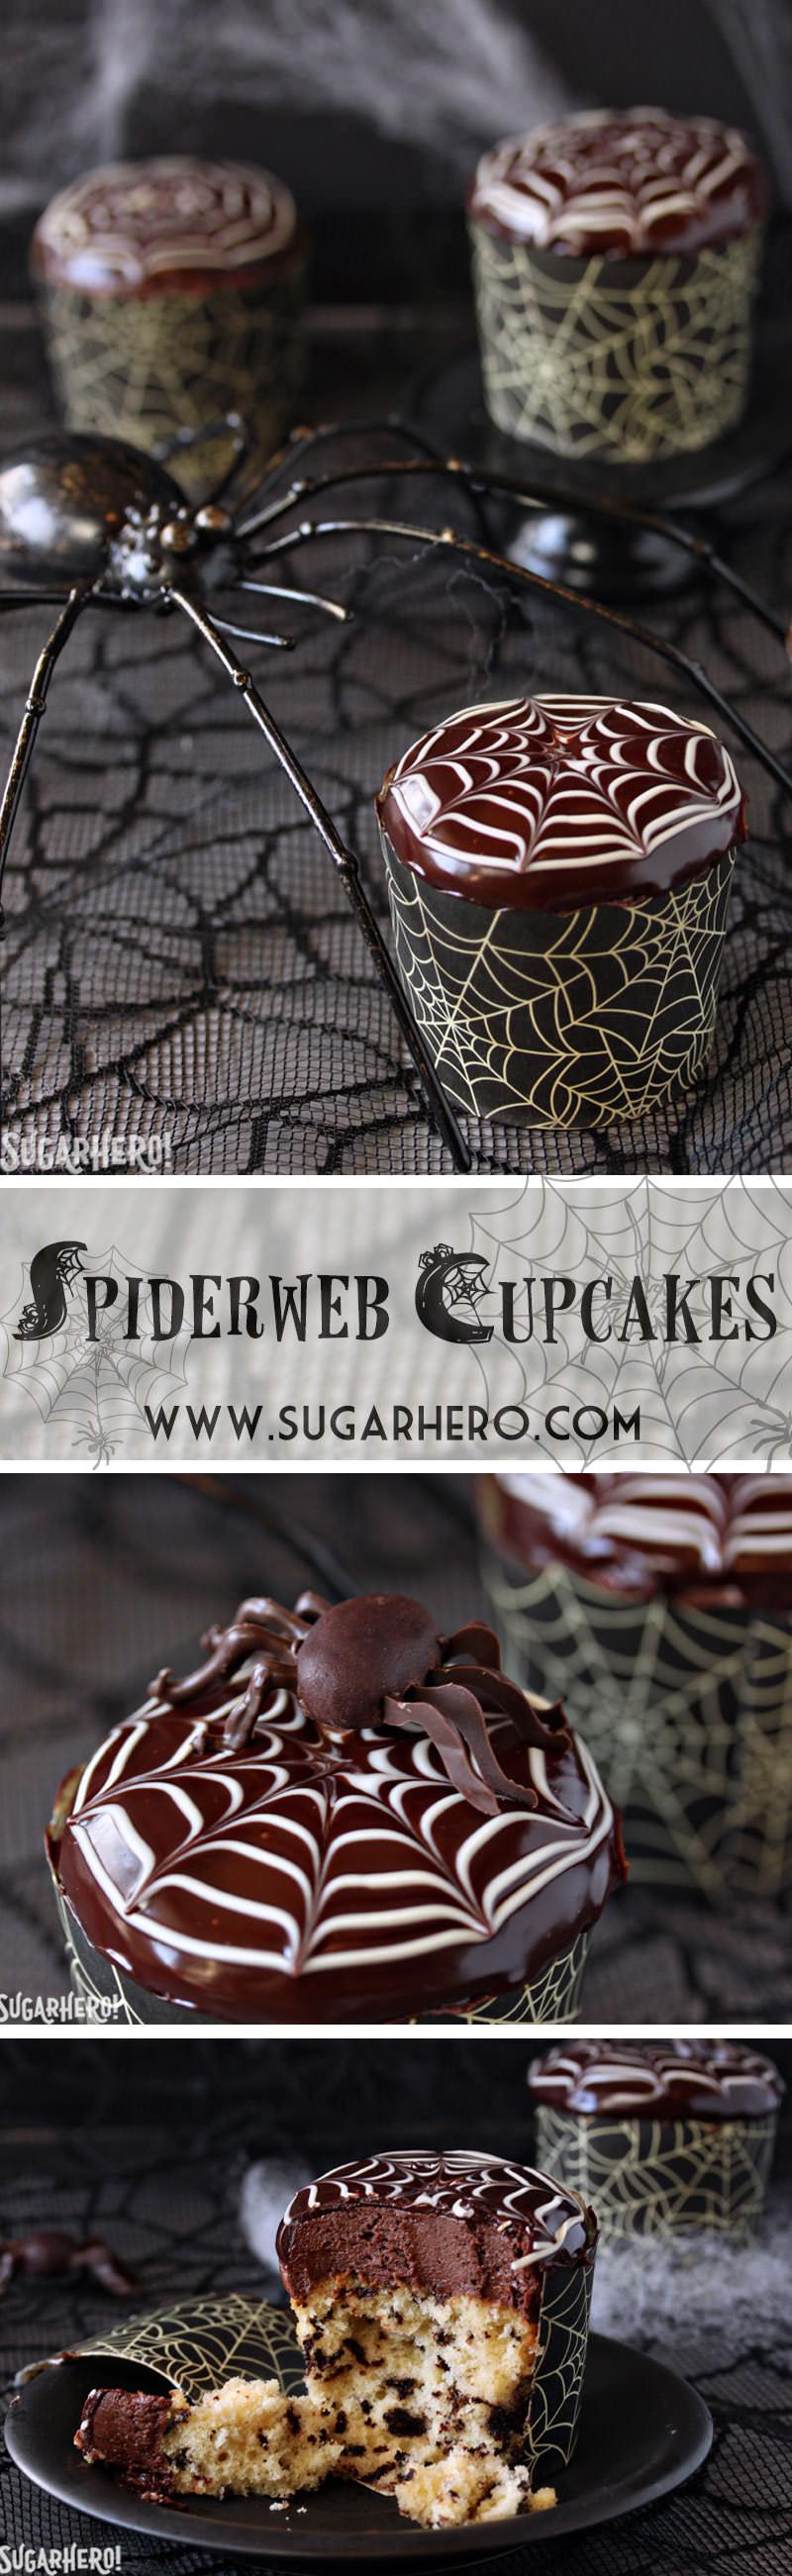 Spiderweb Cupcakes and Chocolate Spiders Recipe | From SugarHero.com